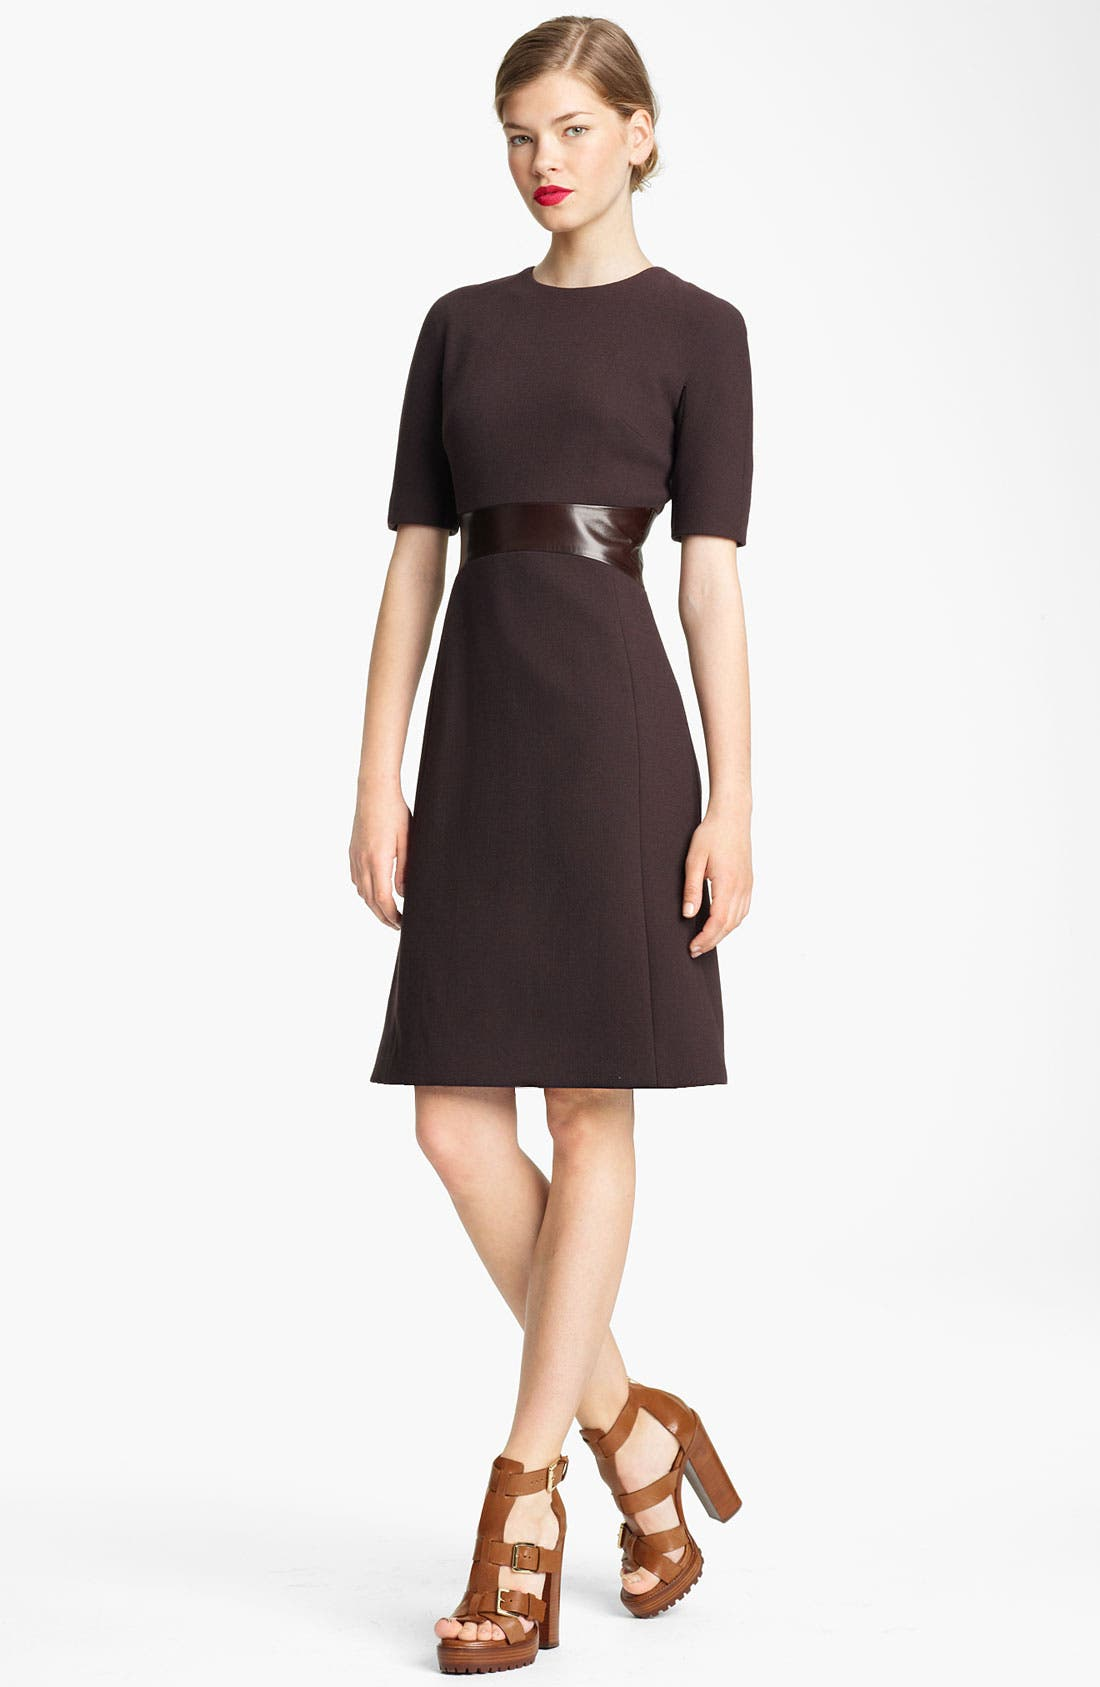 Main Image - Michael Kors Leather Waist Bouclé Crepe Dress